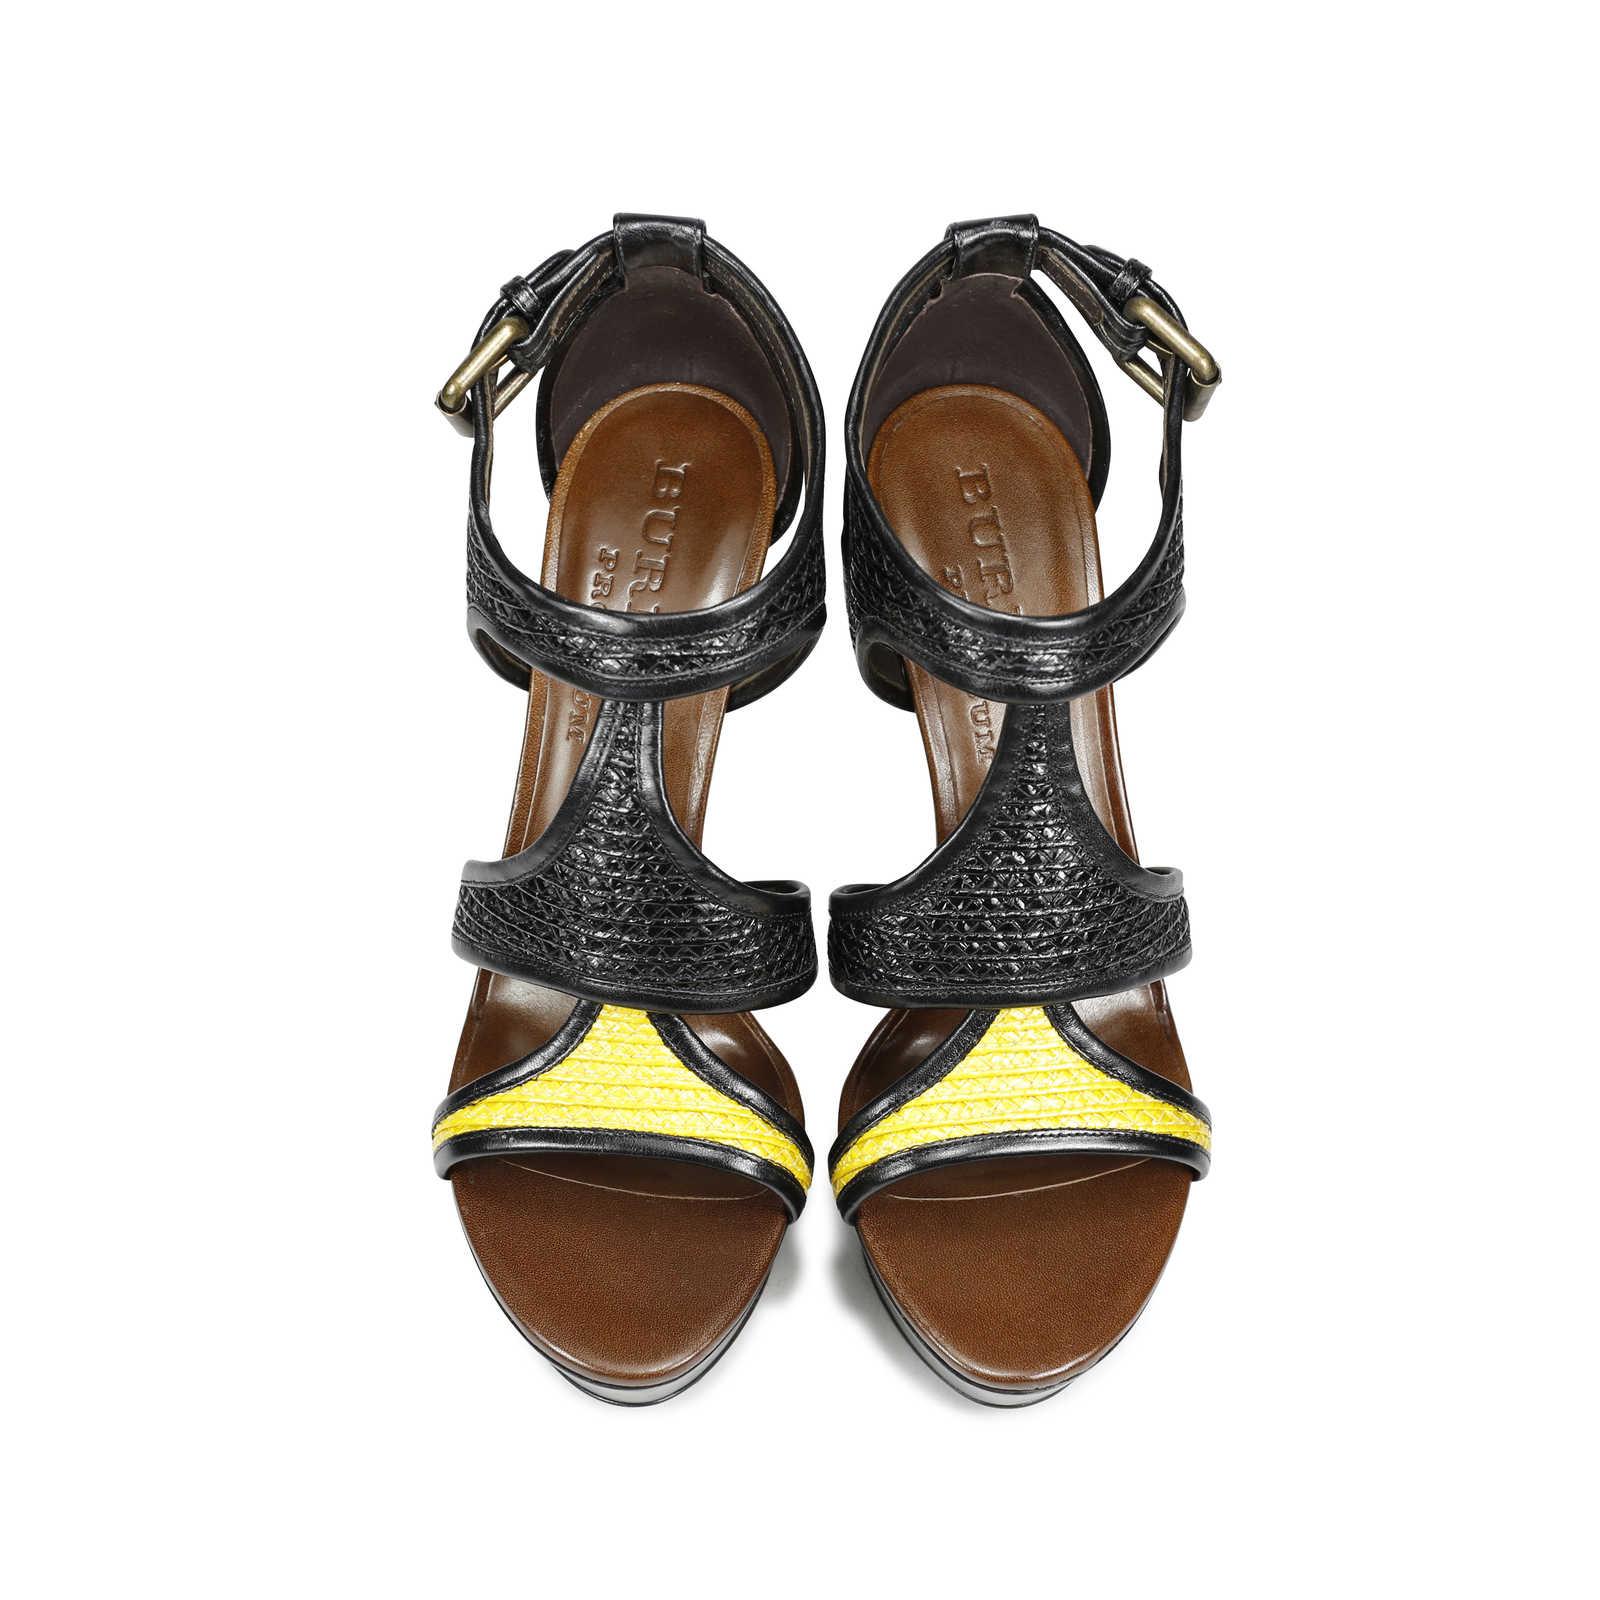 burberry-prorsum-raffia-interwoven-sandals-1.jpg